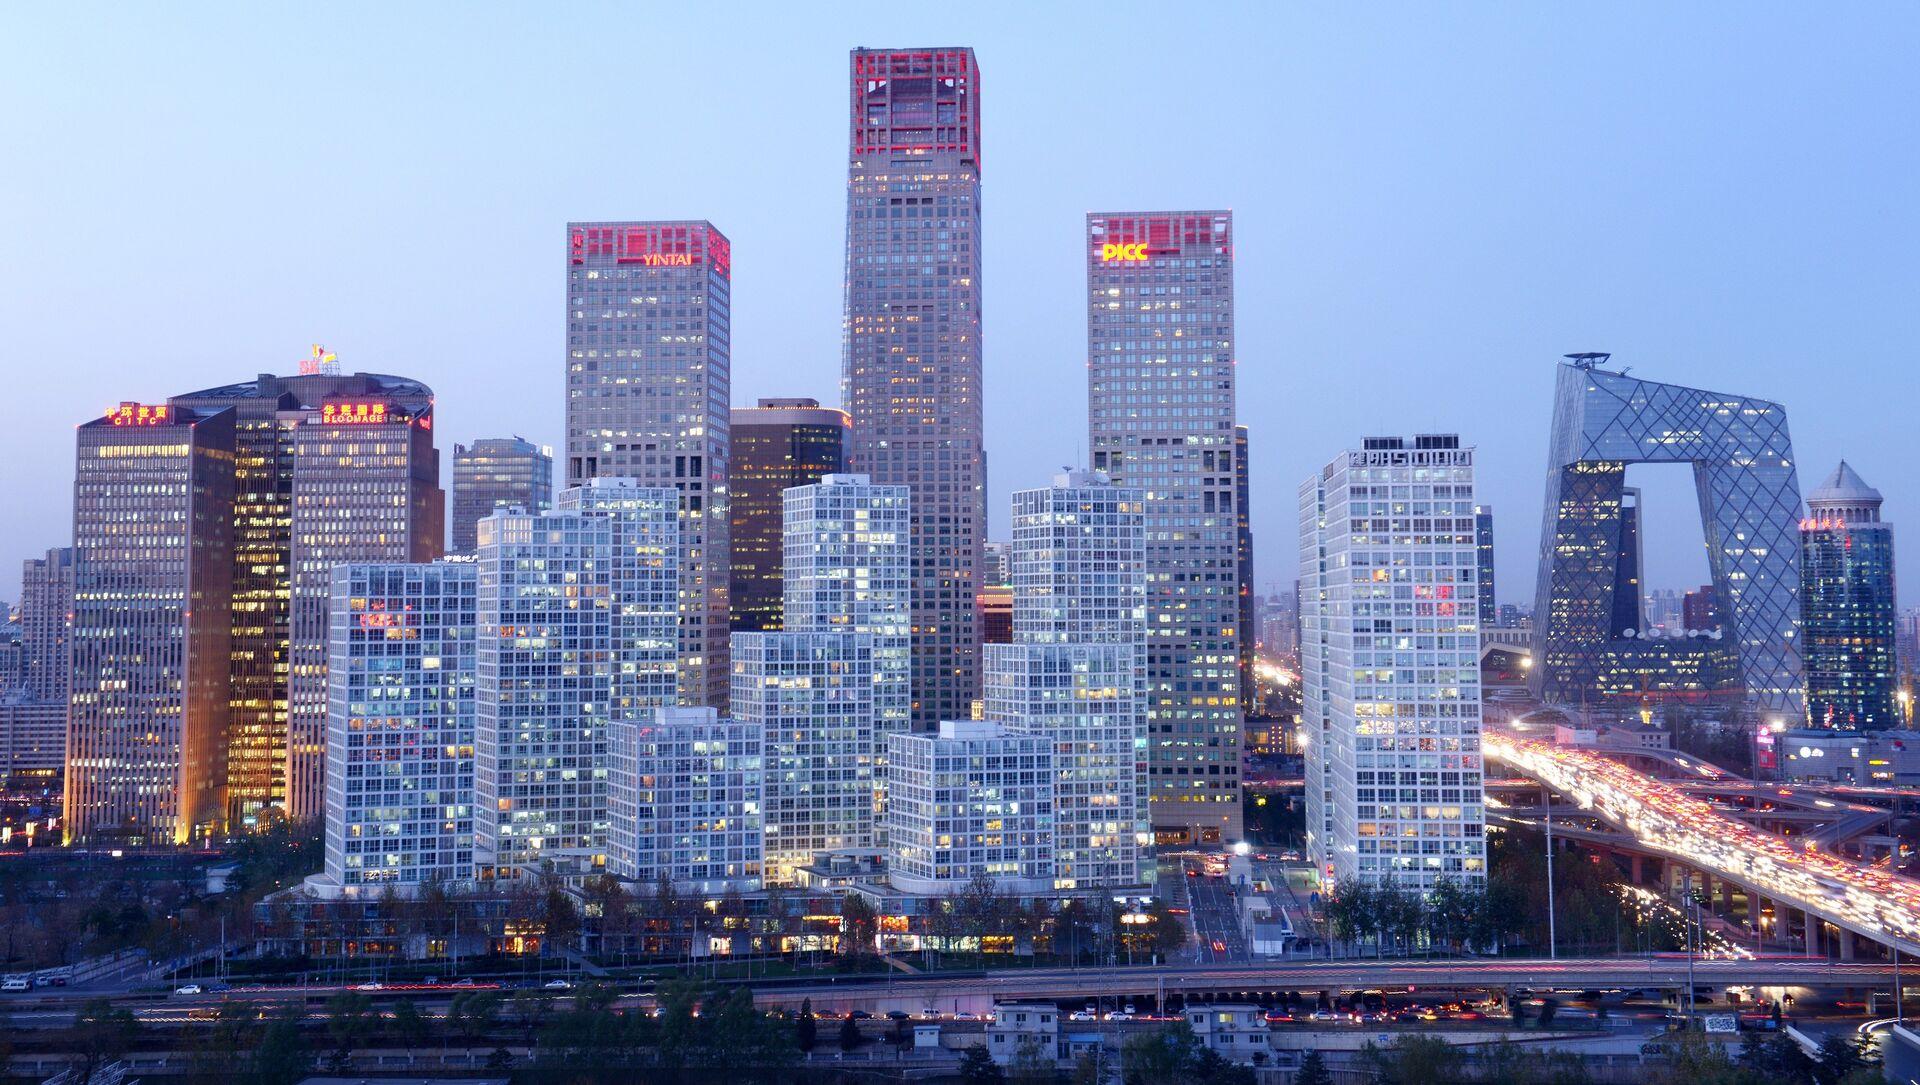 Pekín, la capital de China - Sputnik Mundo, 1920, 06.10.2020